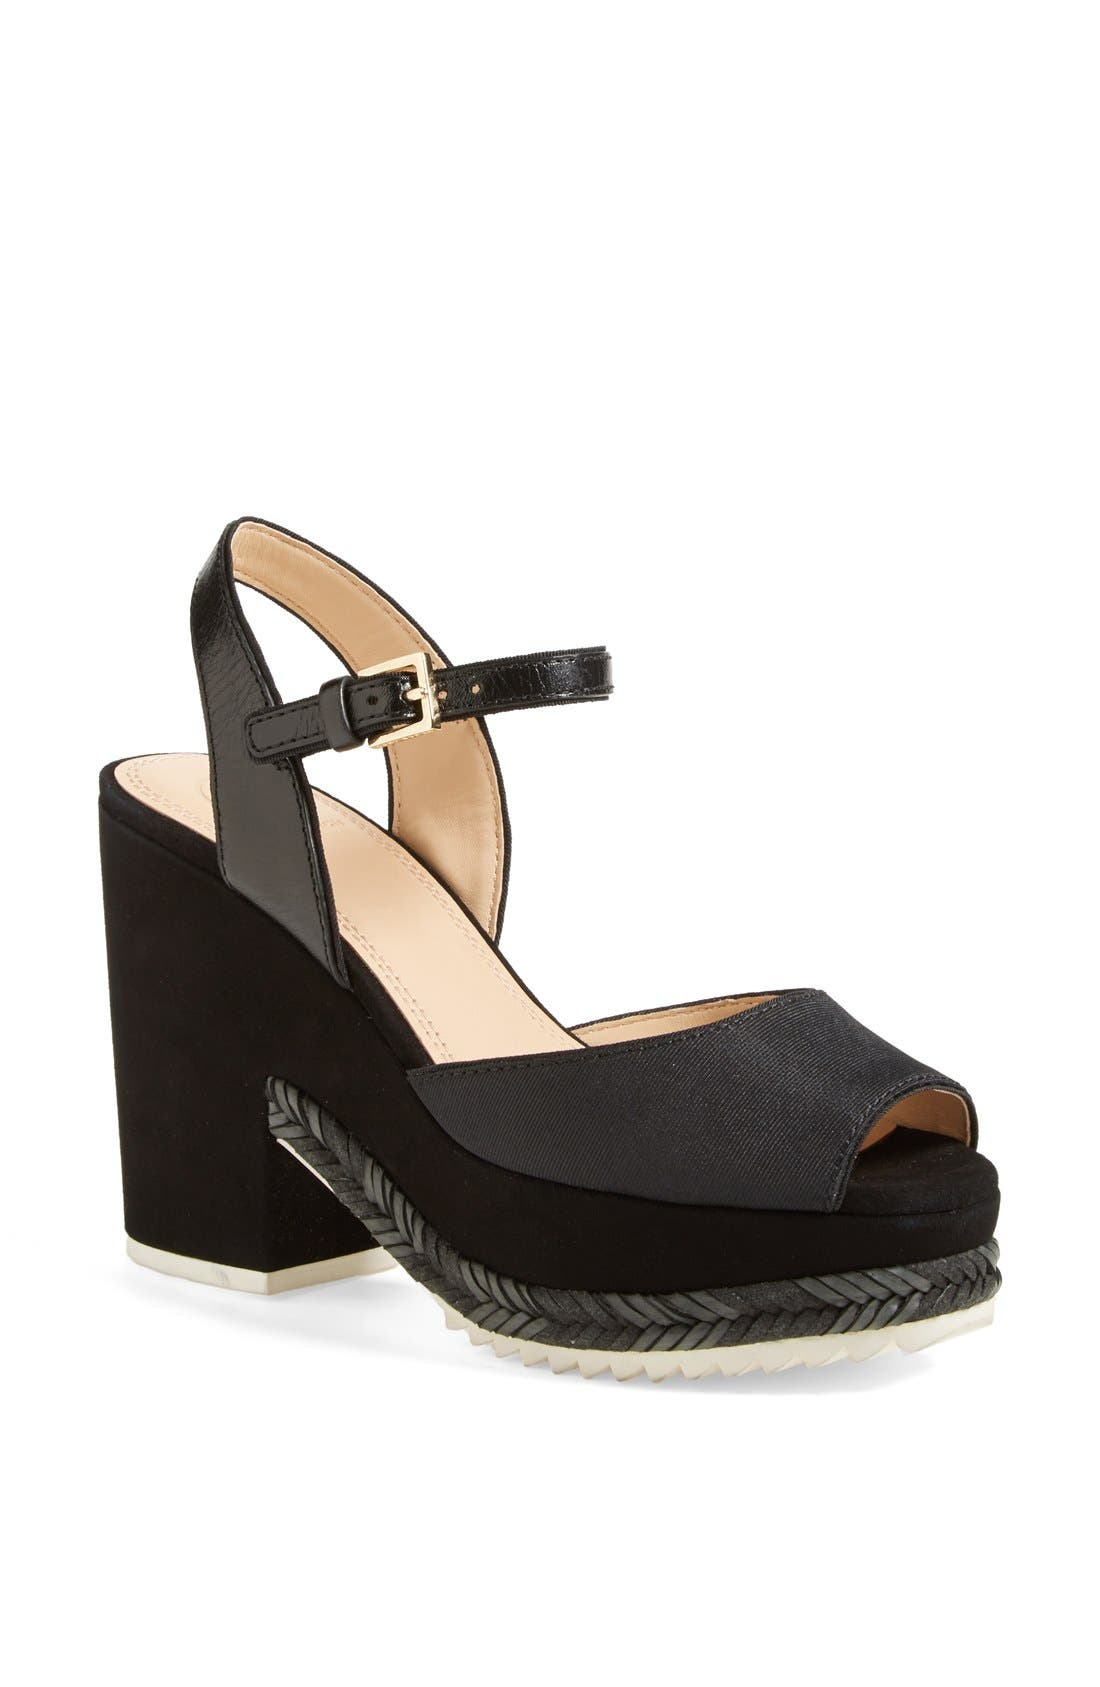 Main Image - Tory Burch 'Brie' Platform Sandal